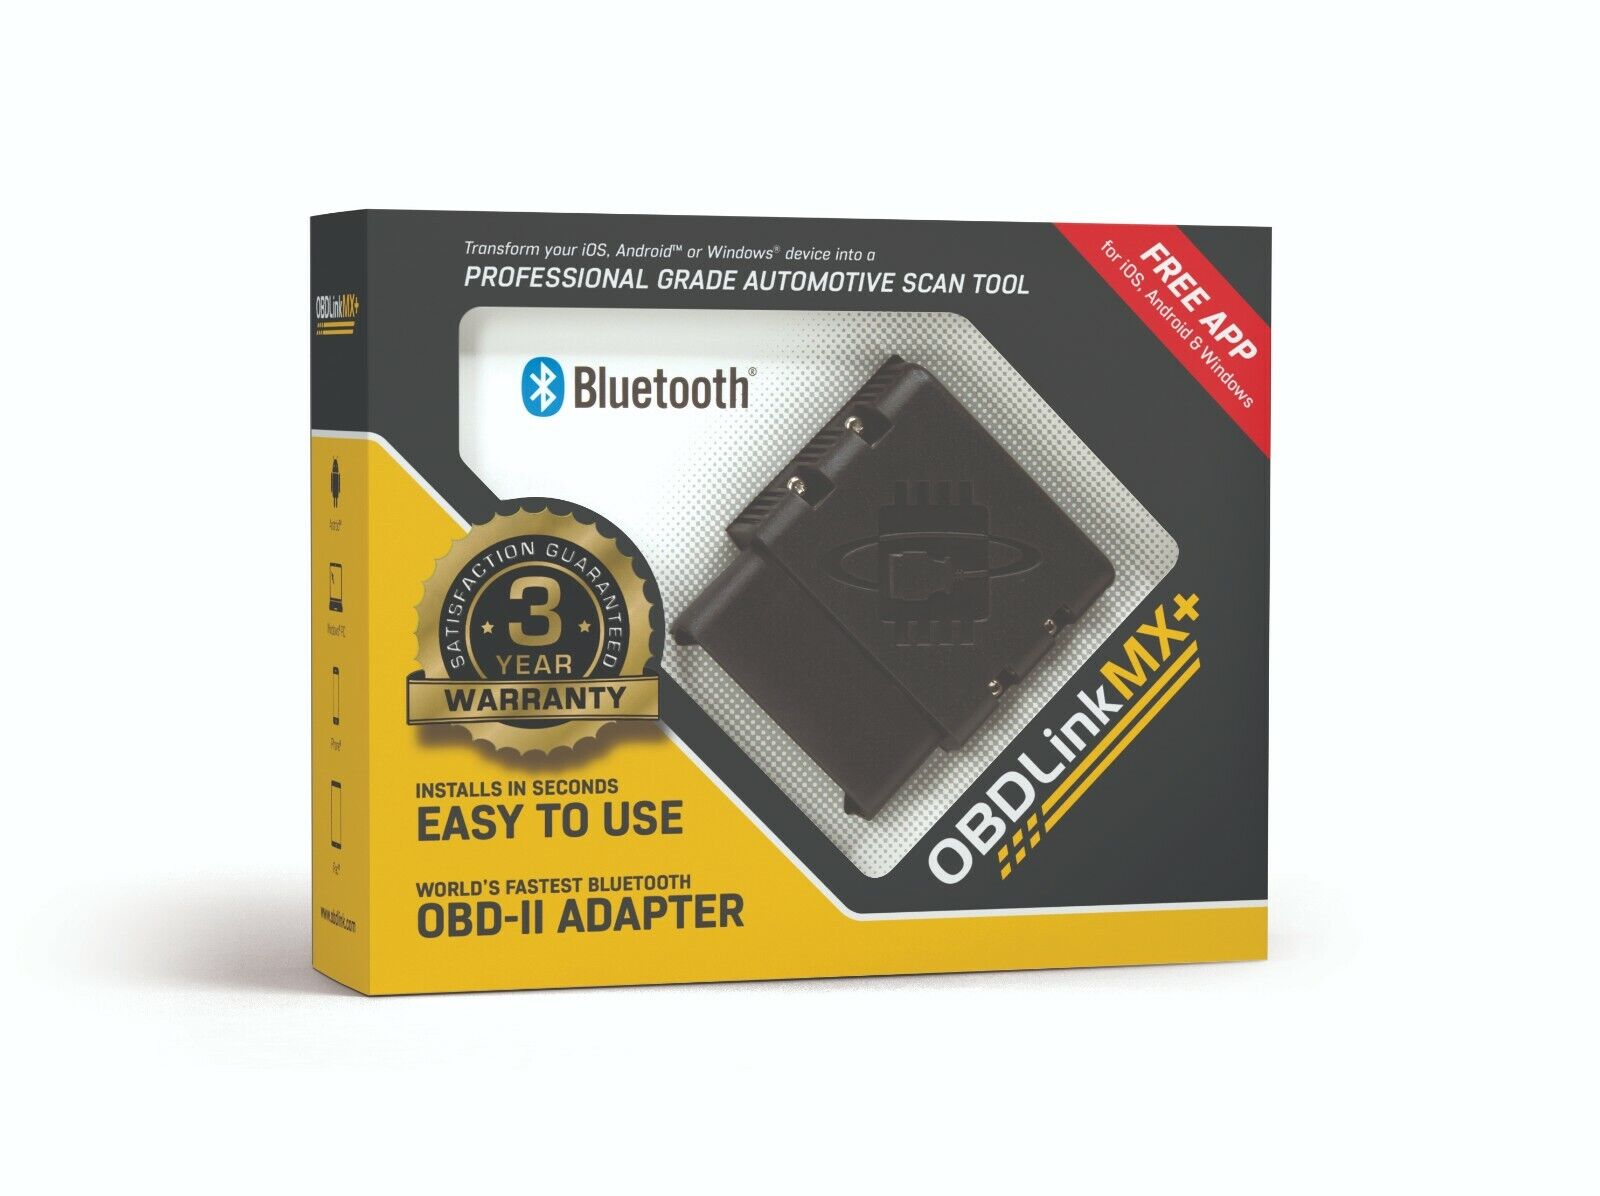 OBDLink MX+ Bluetooth Professional Grade OBD-II Automotive Scan Tool